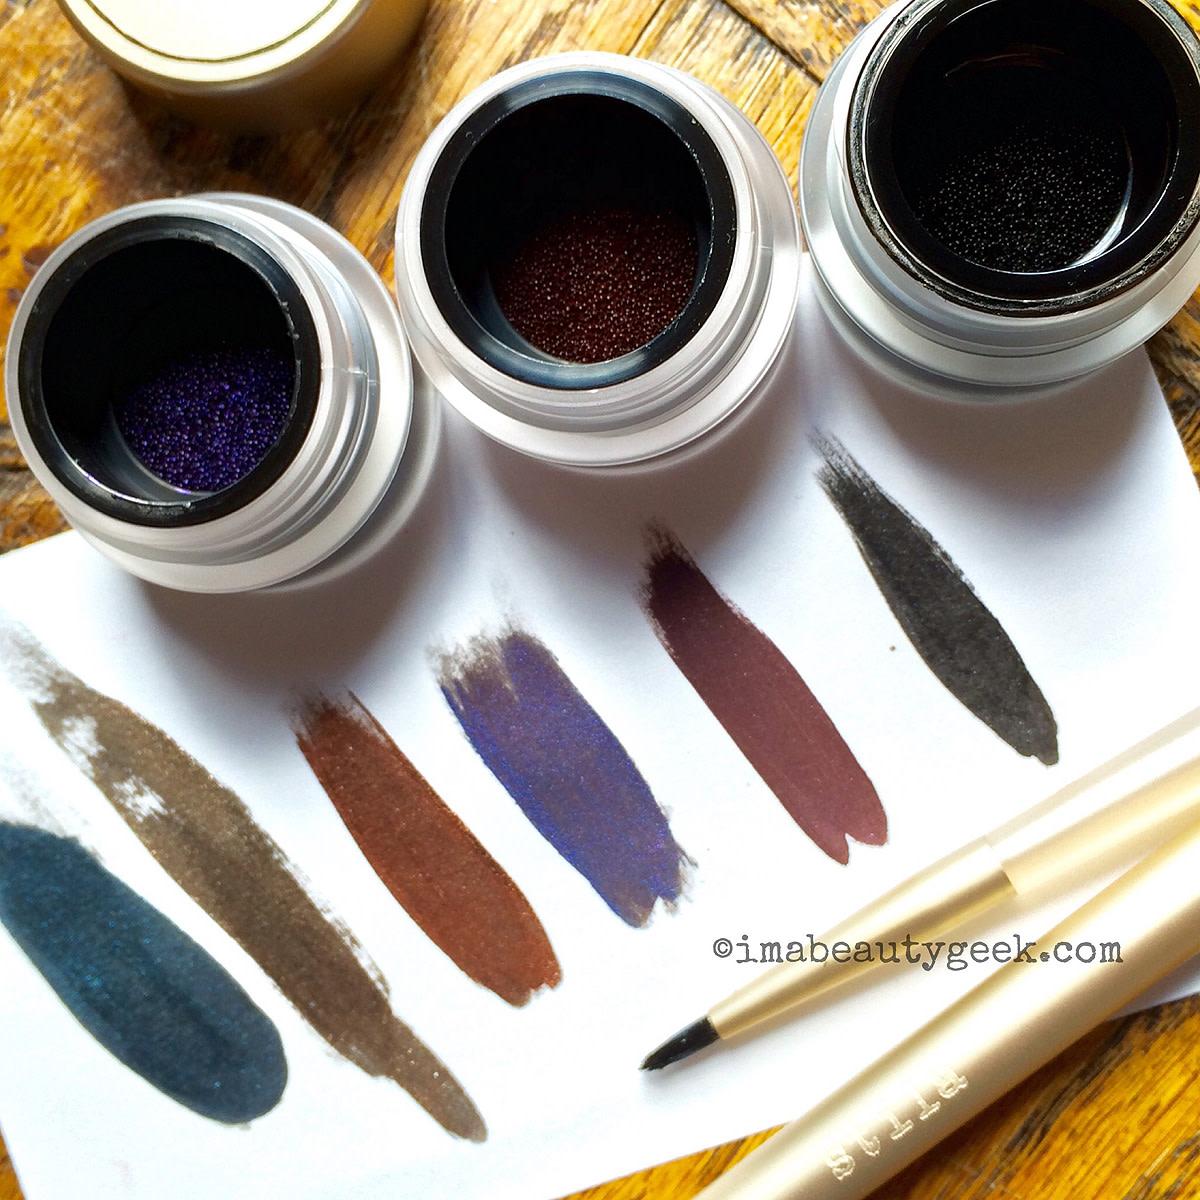 Sephora drops free-shipping minimum_Stila Got Inked Cushion Eyeliner and La Quill brush